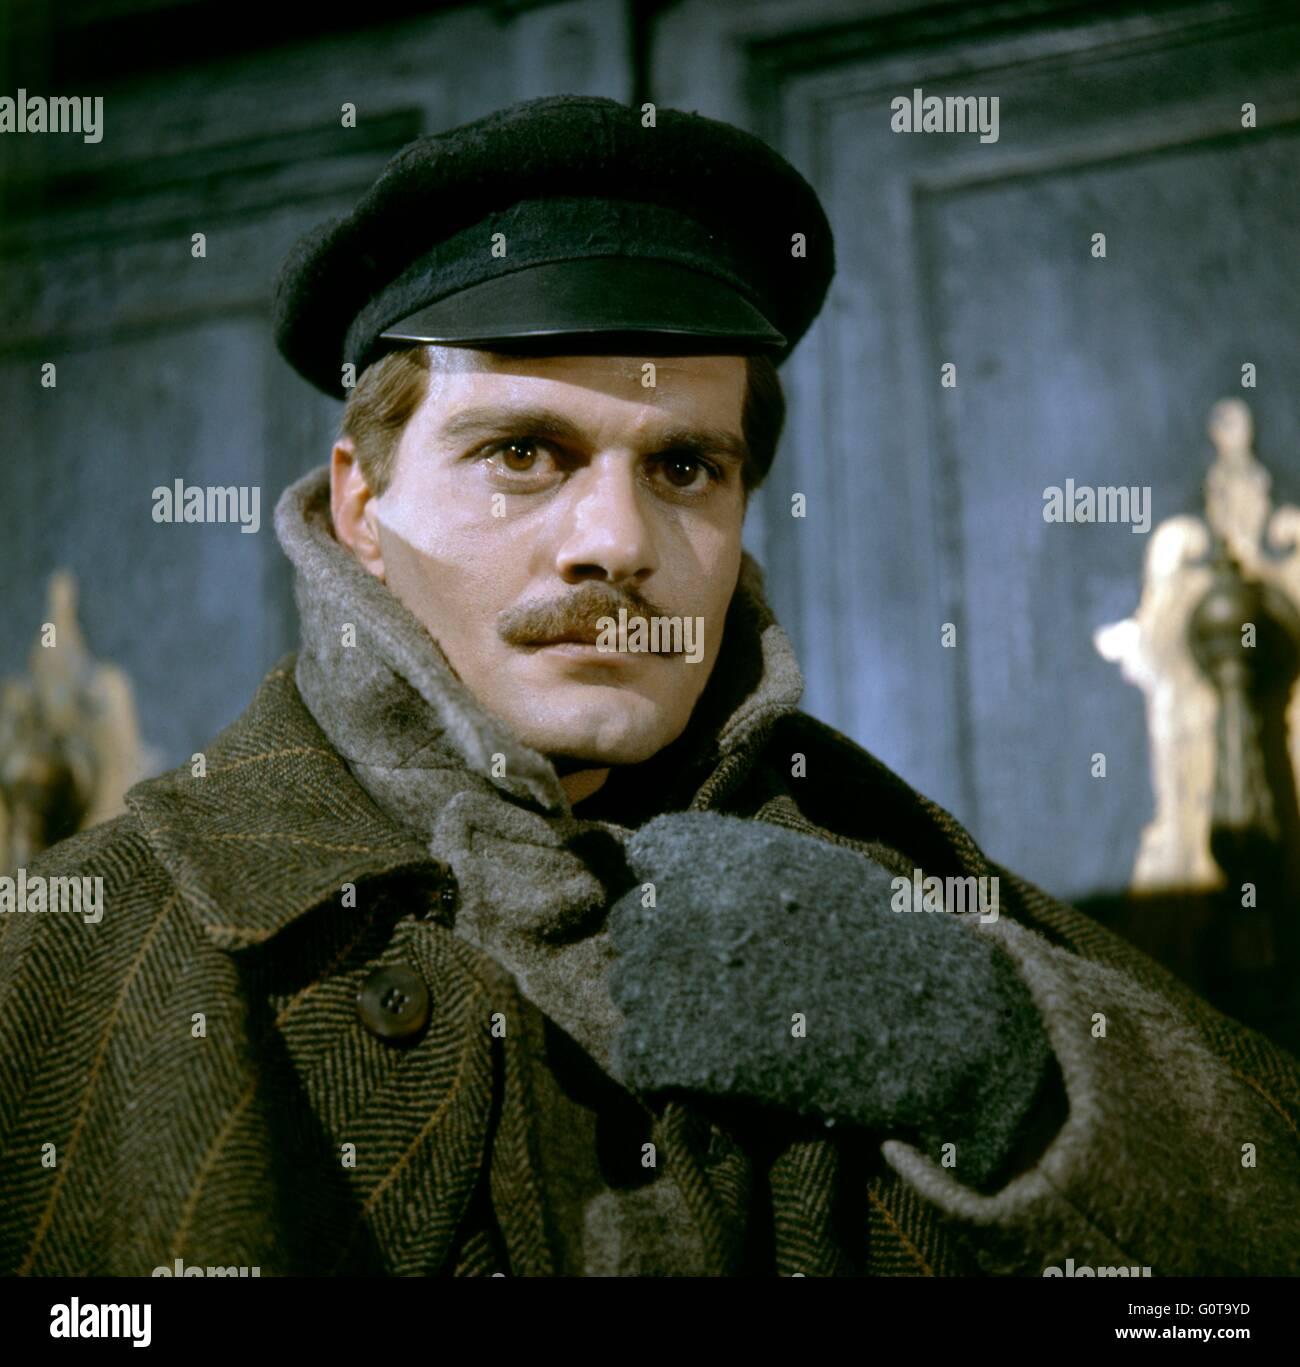 Omar Sharif / Doctor Zhivago / 1965 directed by David Lean  [Carlo Ponti Production / Metro-Goldwyn-Mayer] - Stock Image